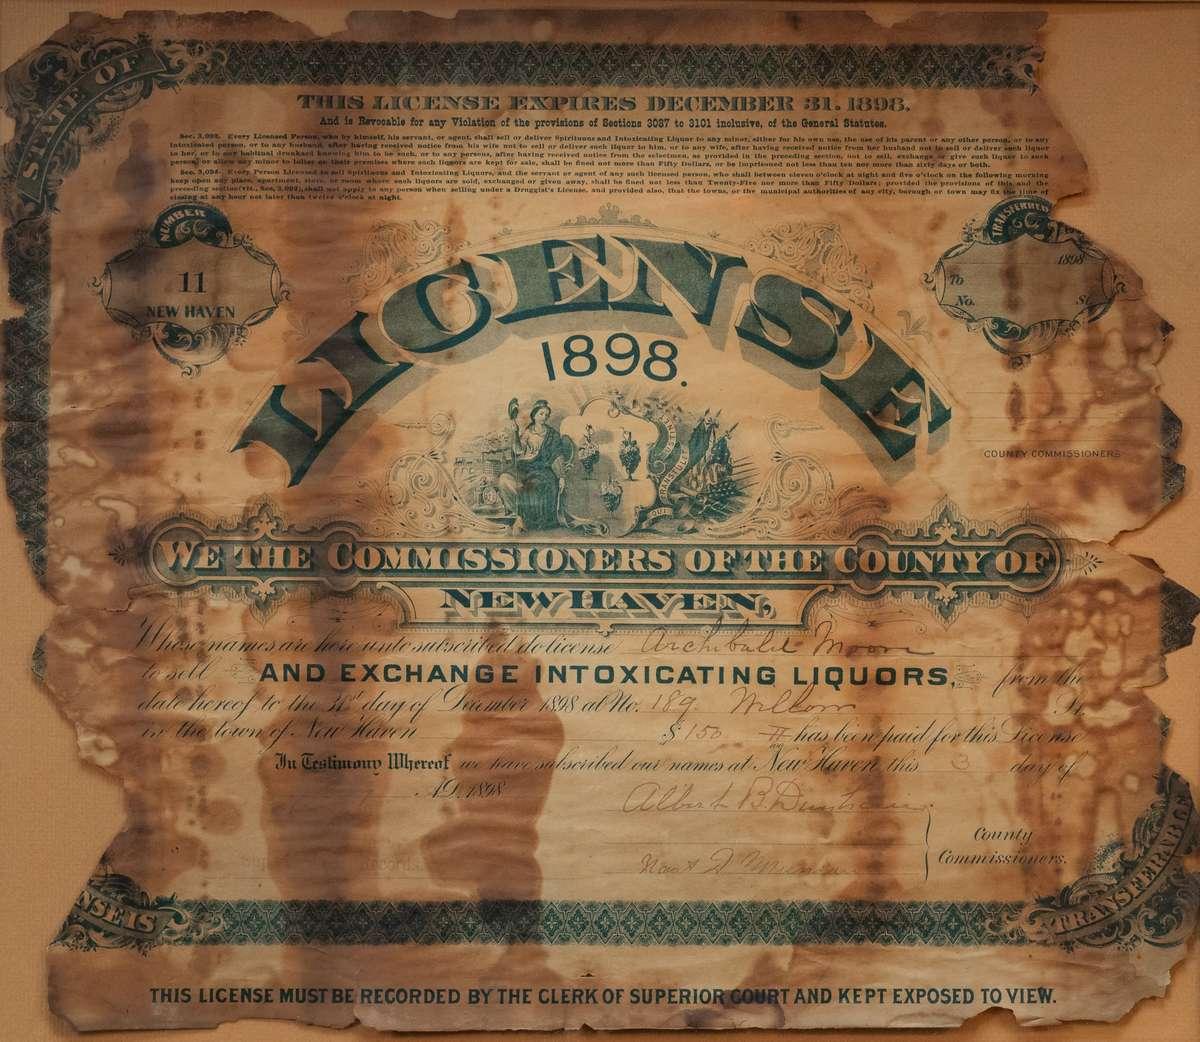 Old liquor license